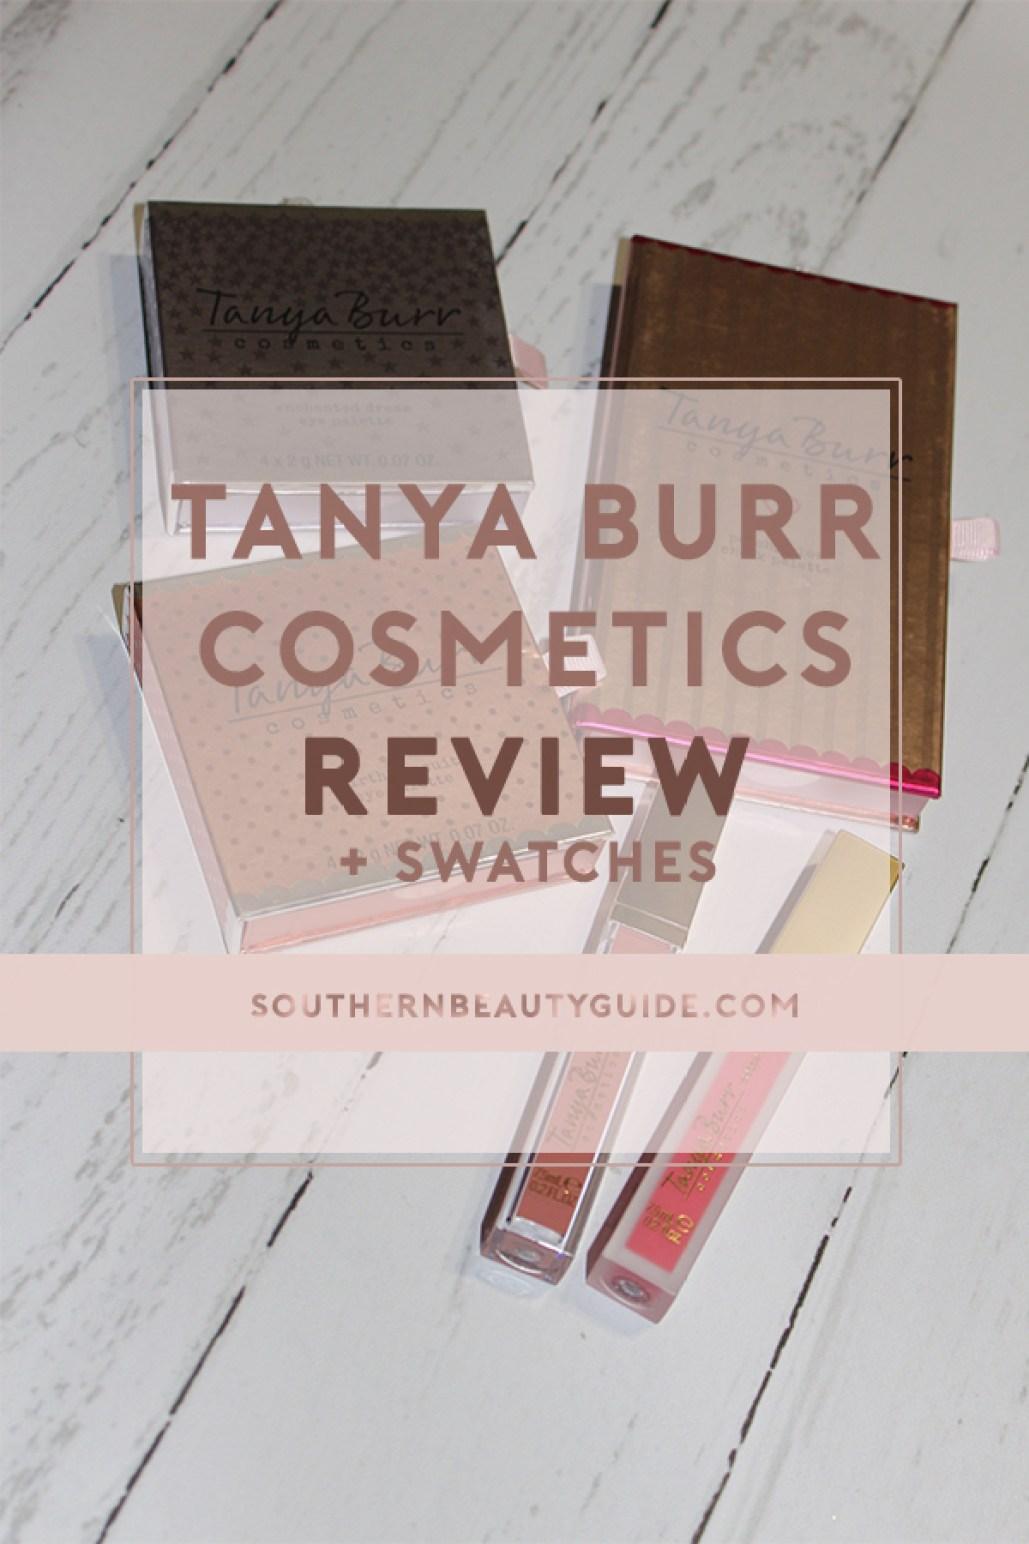 tanya-burr-cosmetics-review